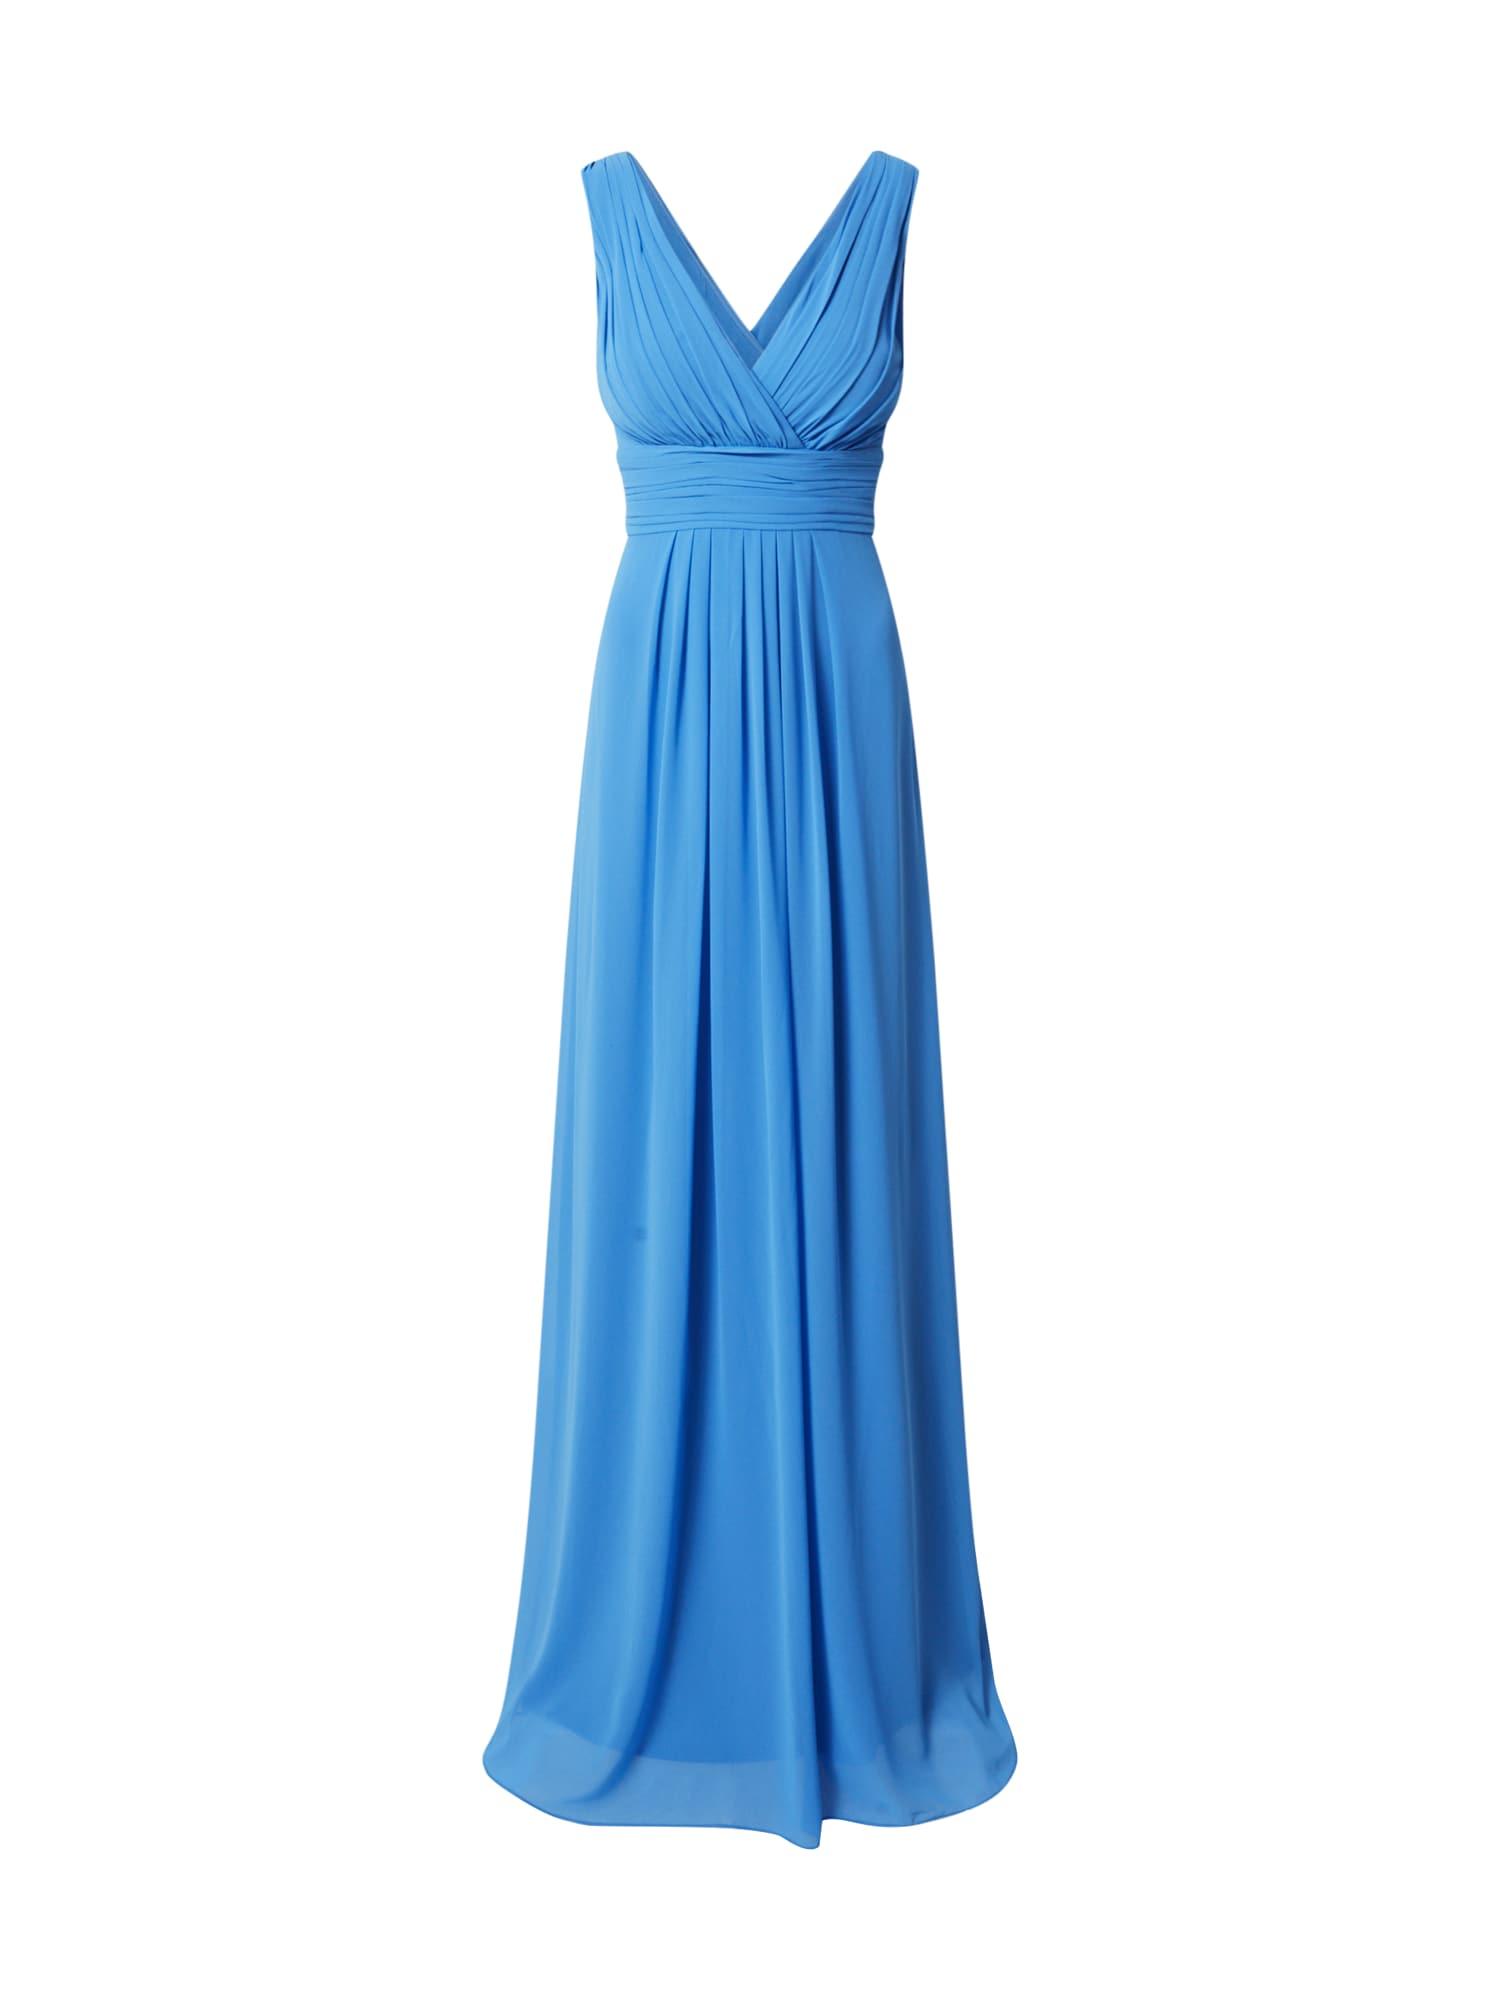 STAR NIGHT Suknelė mėlyna